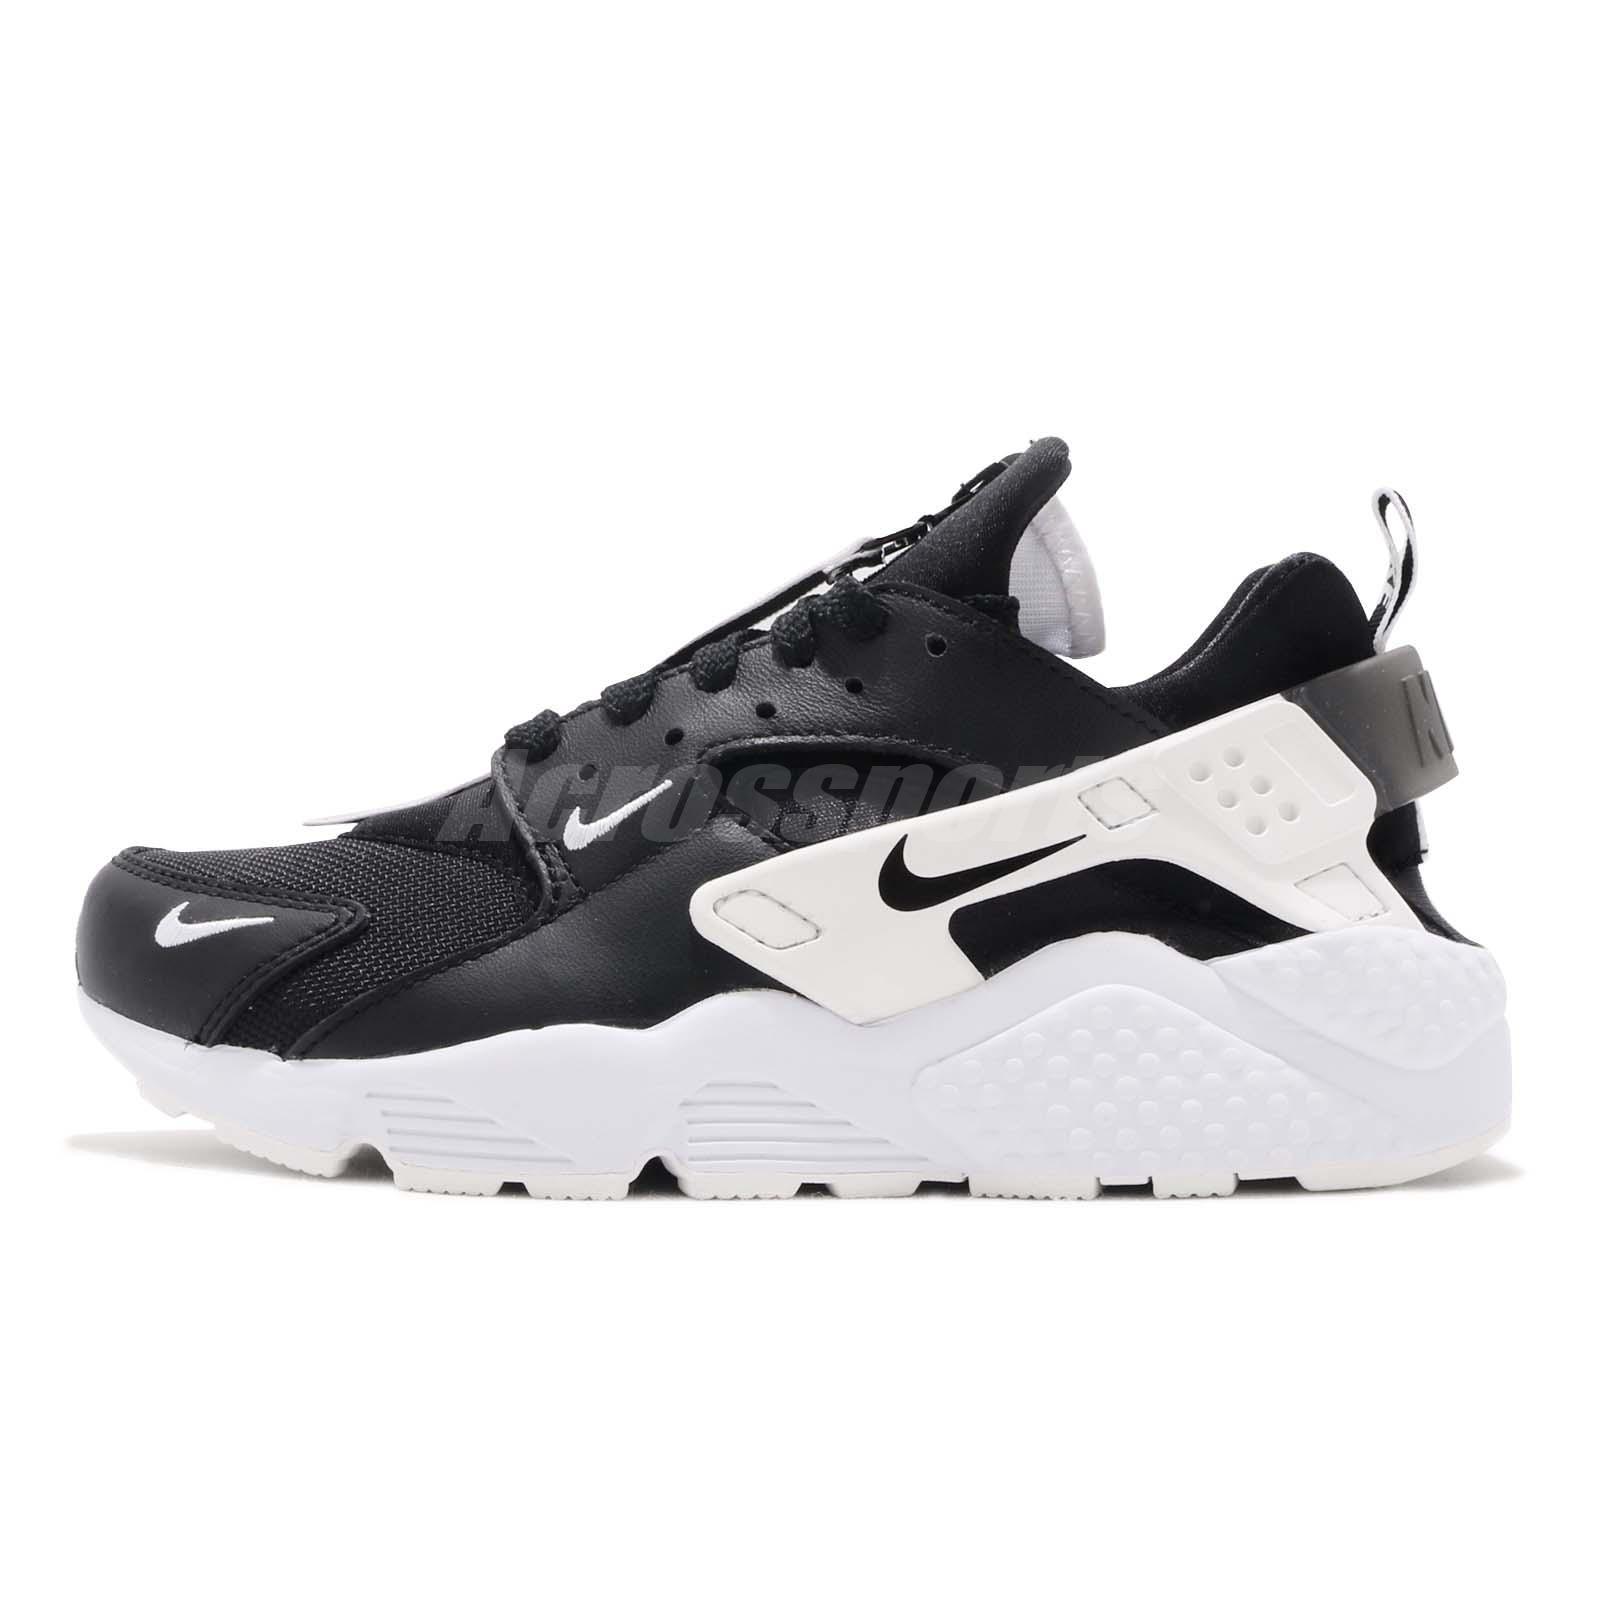 cc43c94dbf18 Nike Air Huarache Run PRM Zip Black White Men Casual Shoes Sneakers BQ6164- 001